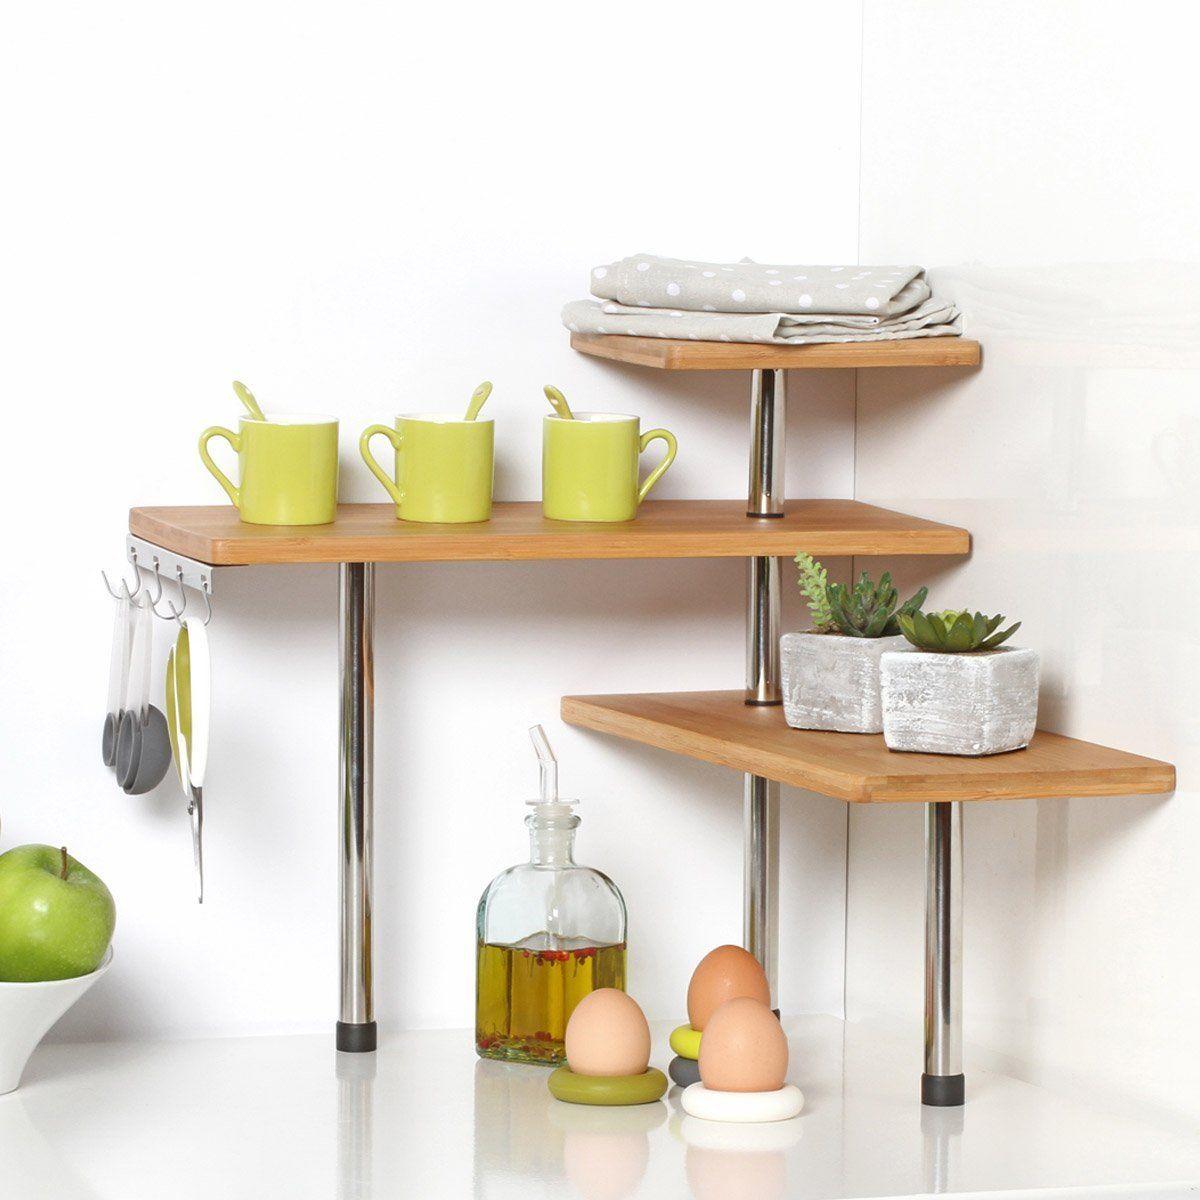 Bamboo And Stainless Steel Corner Shelf Unit Kitchen Bathroom Desktop Perfect Space Saving Idea Ama Kitchen Decor Corner Shelves Space Saving Kitchen